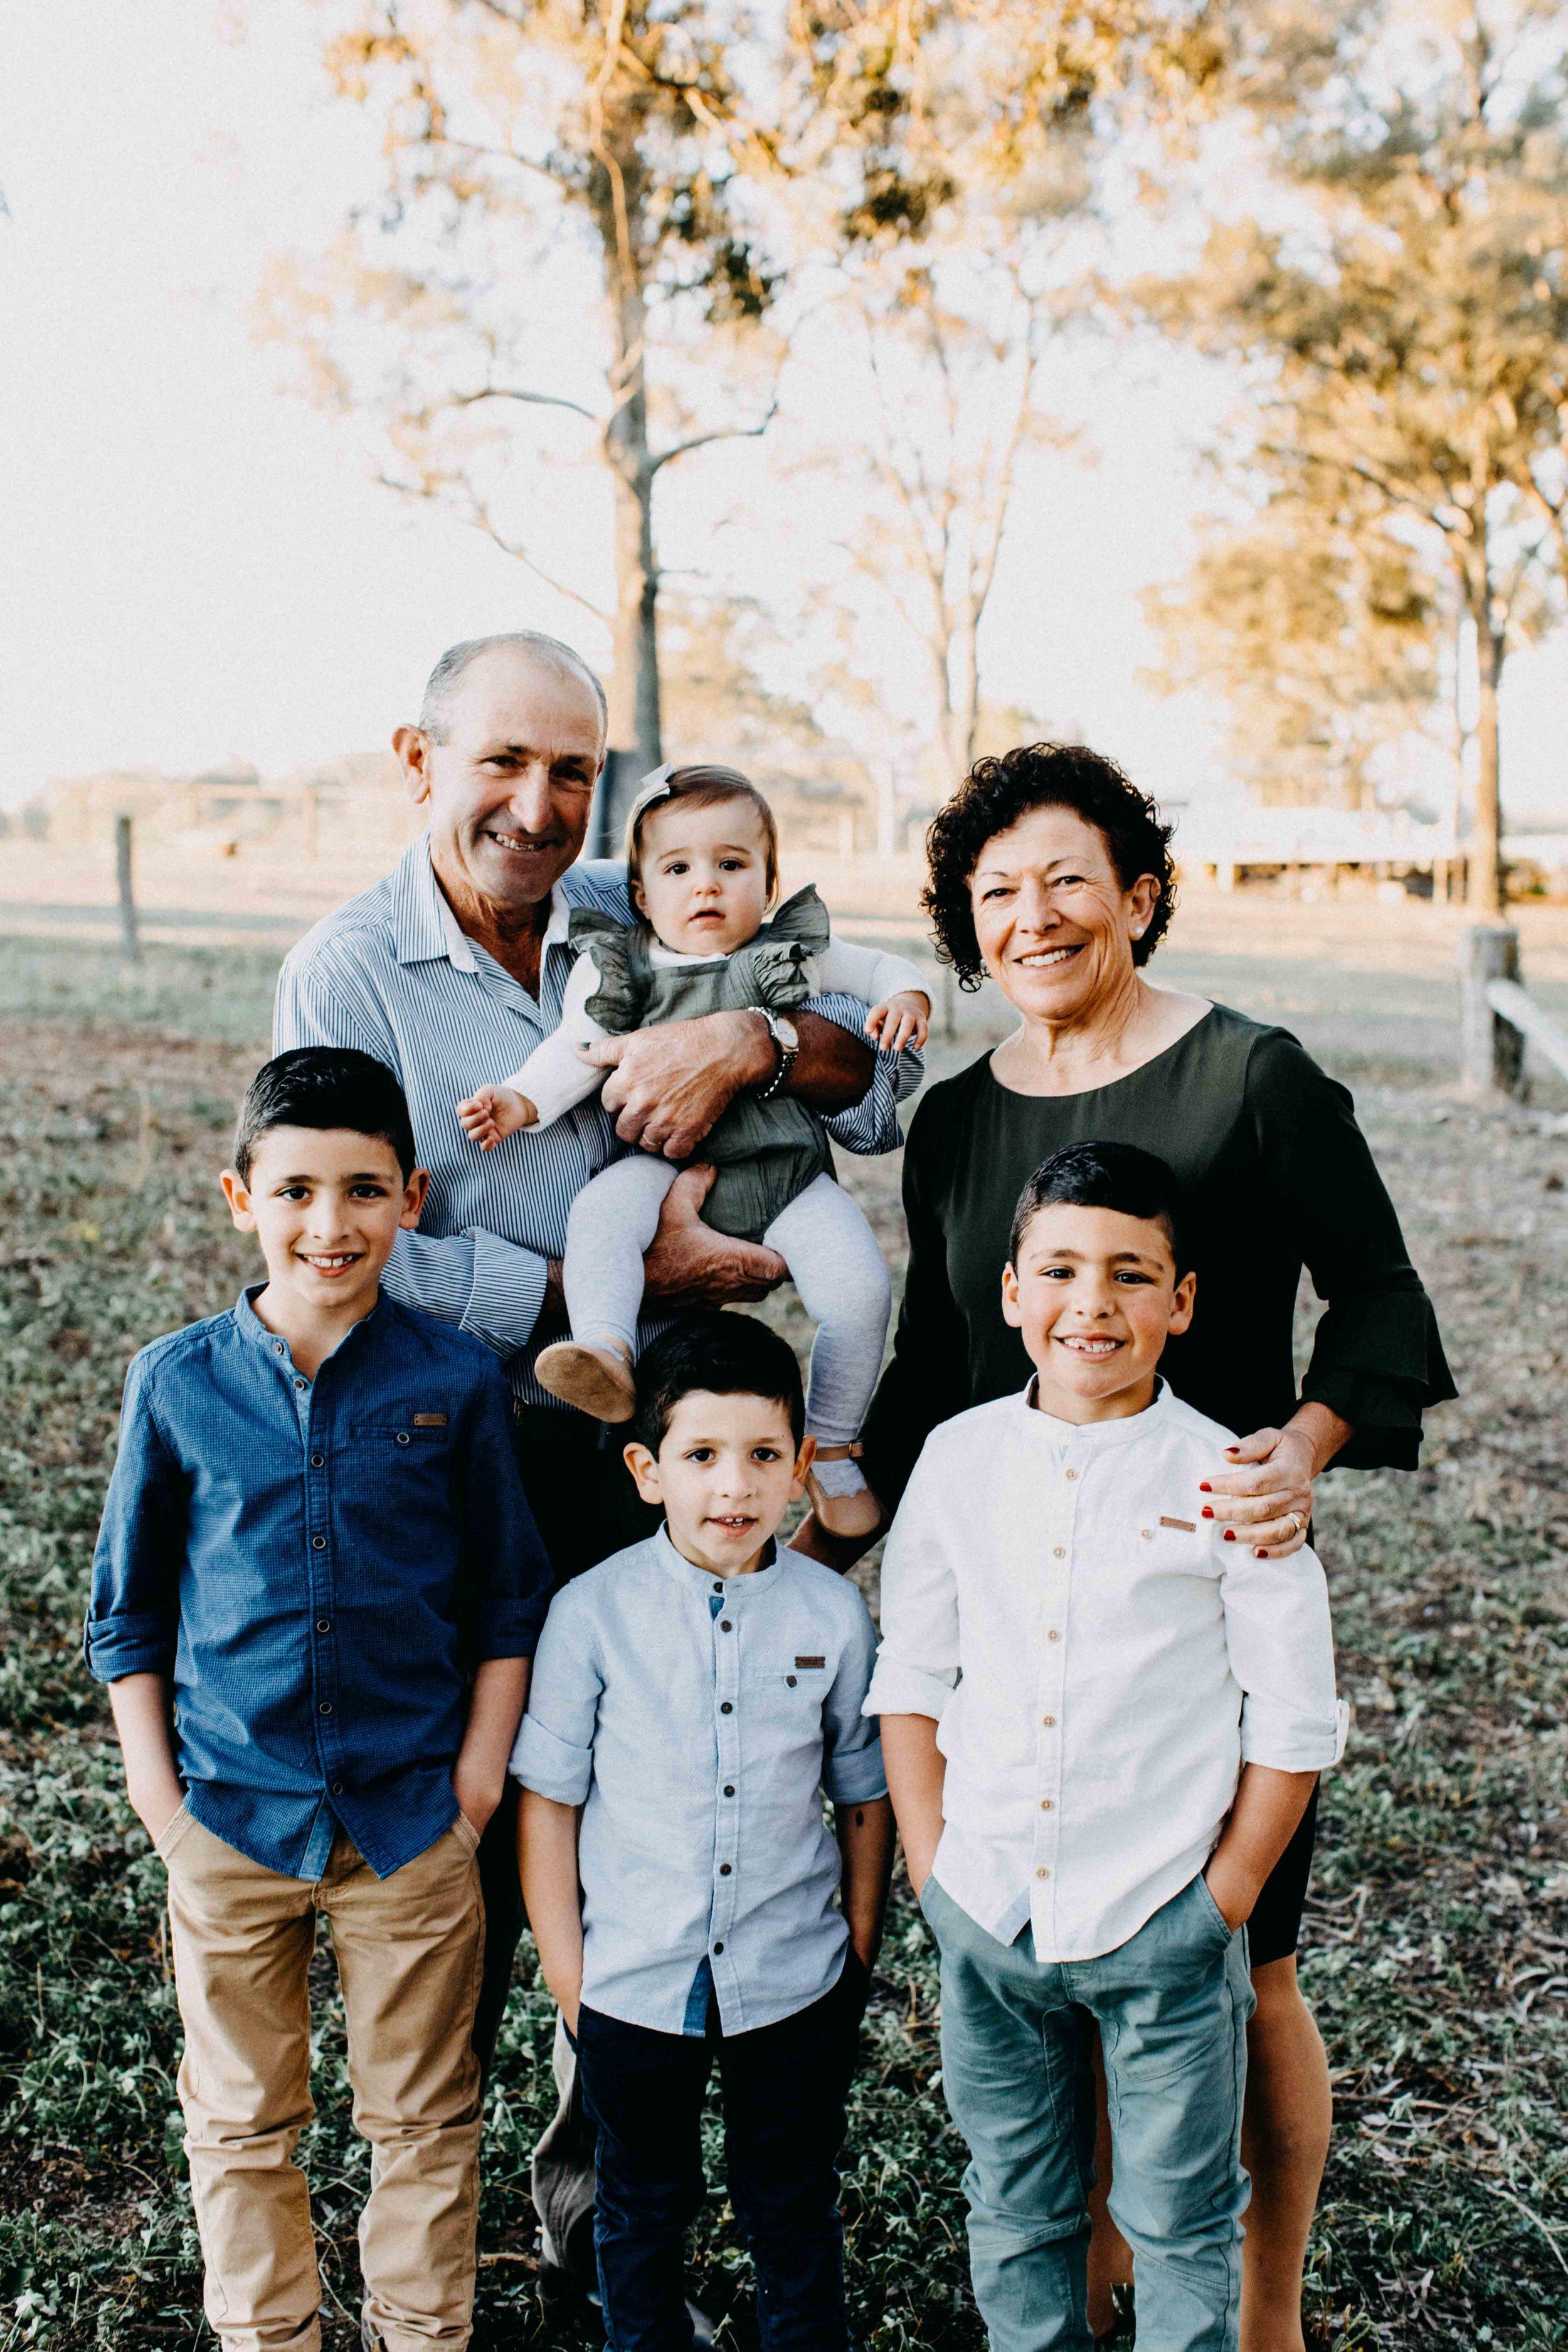 camden-family-photography-galea-www.emilyobrienphotography.net-2.jpg